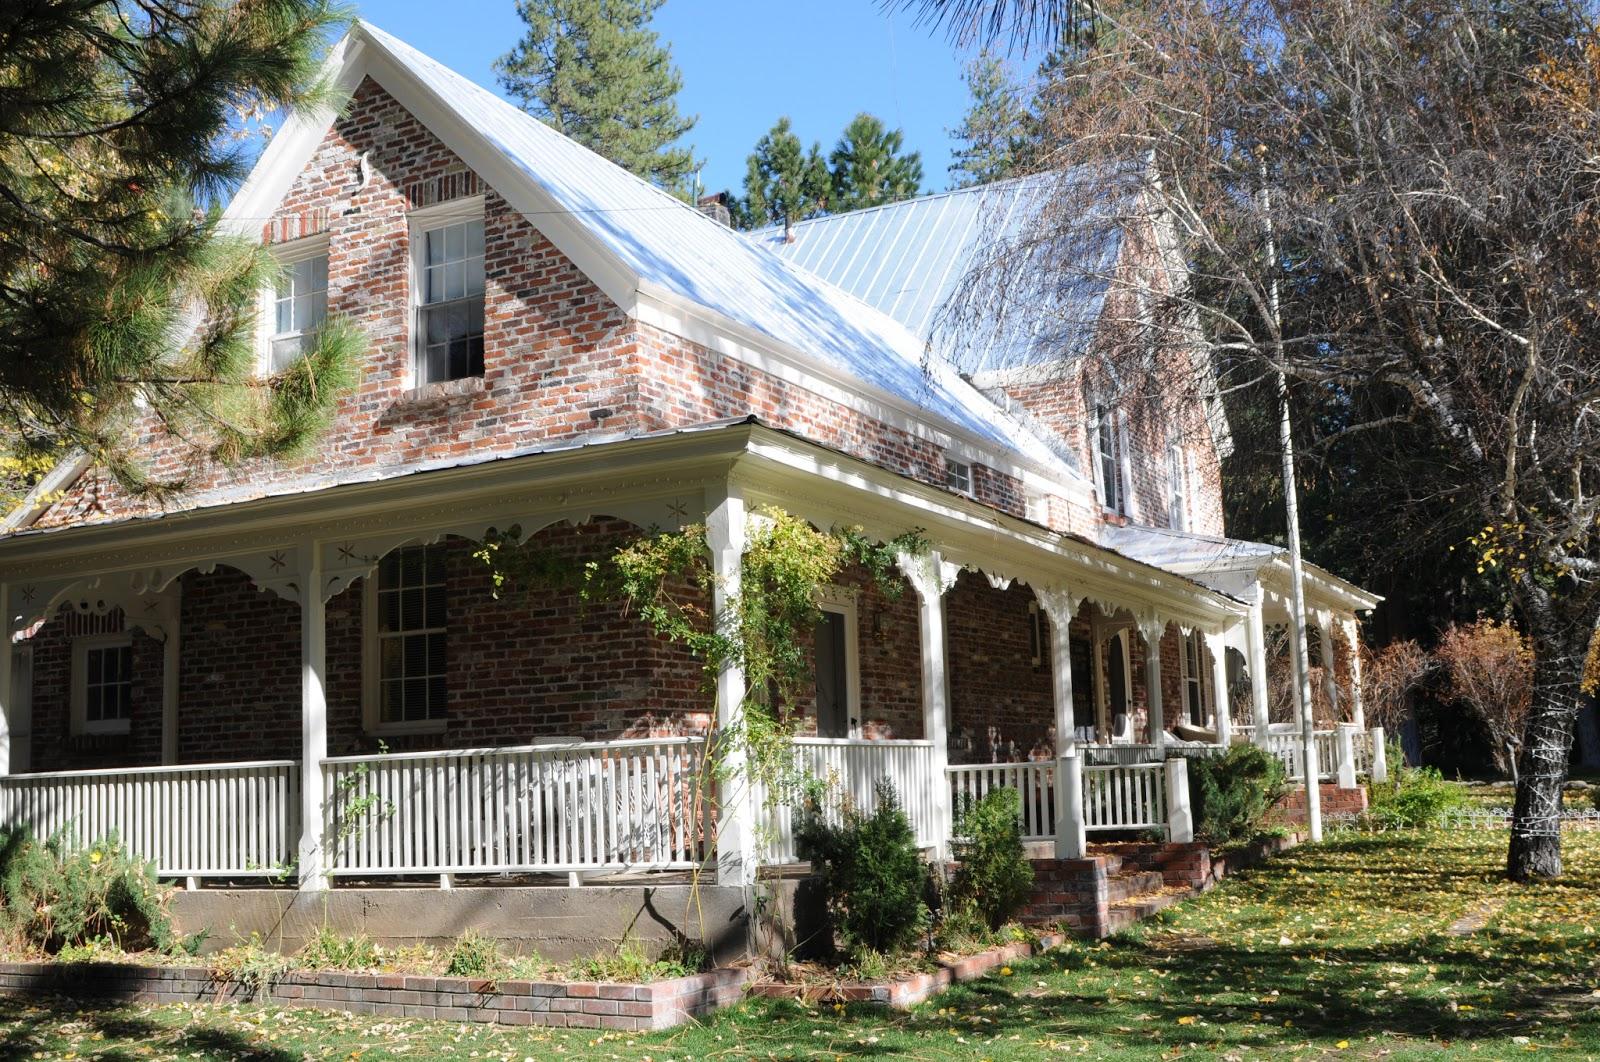 The Victorian House Reno Twenty Mile House A Beautiful Historic All Inclusive Wedding Venue